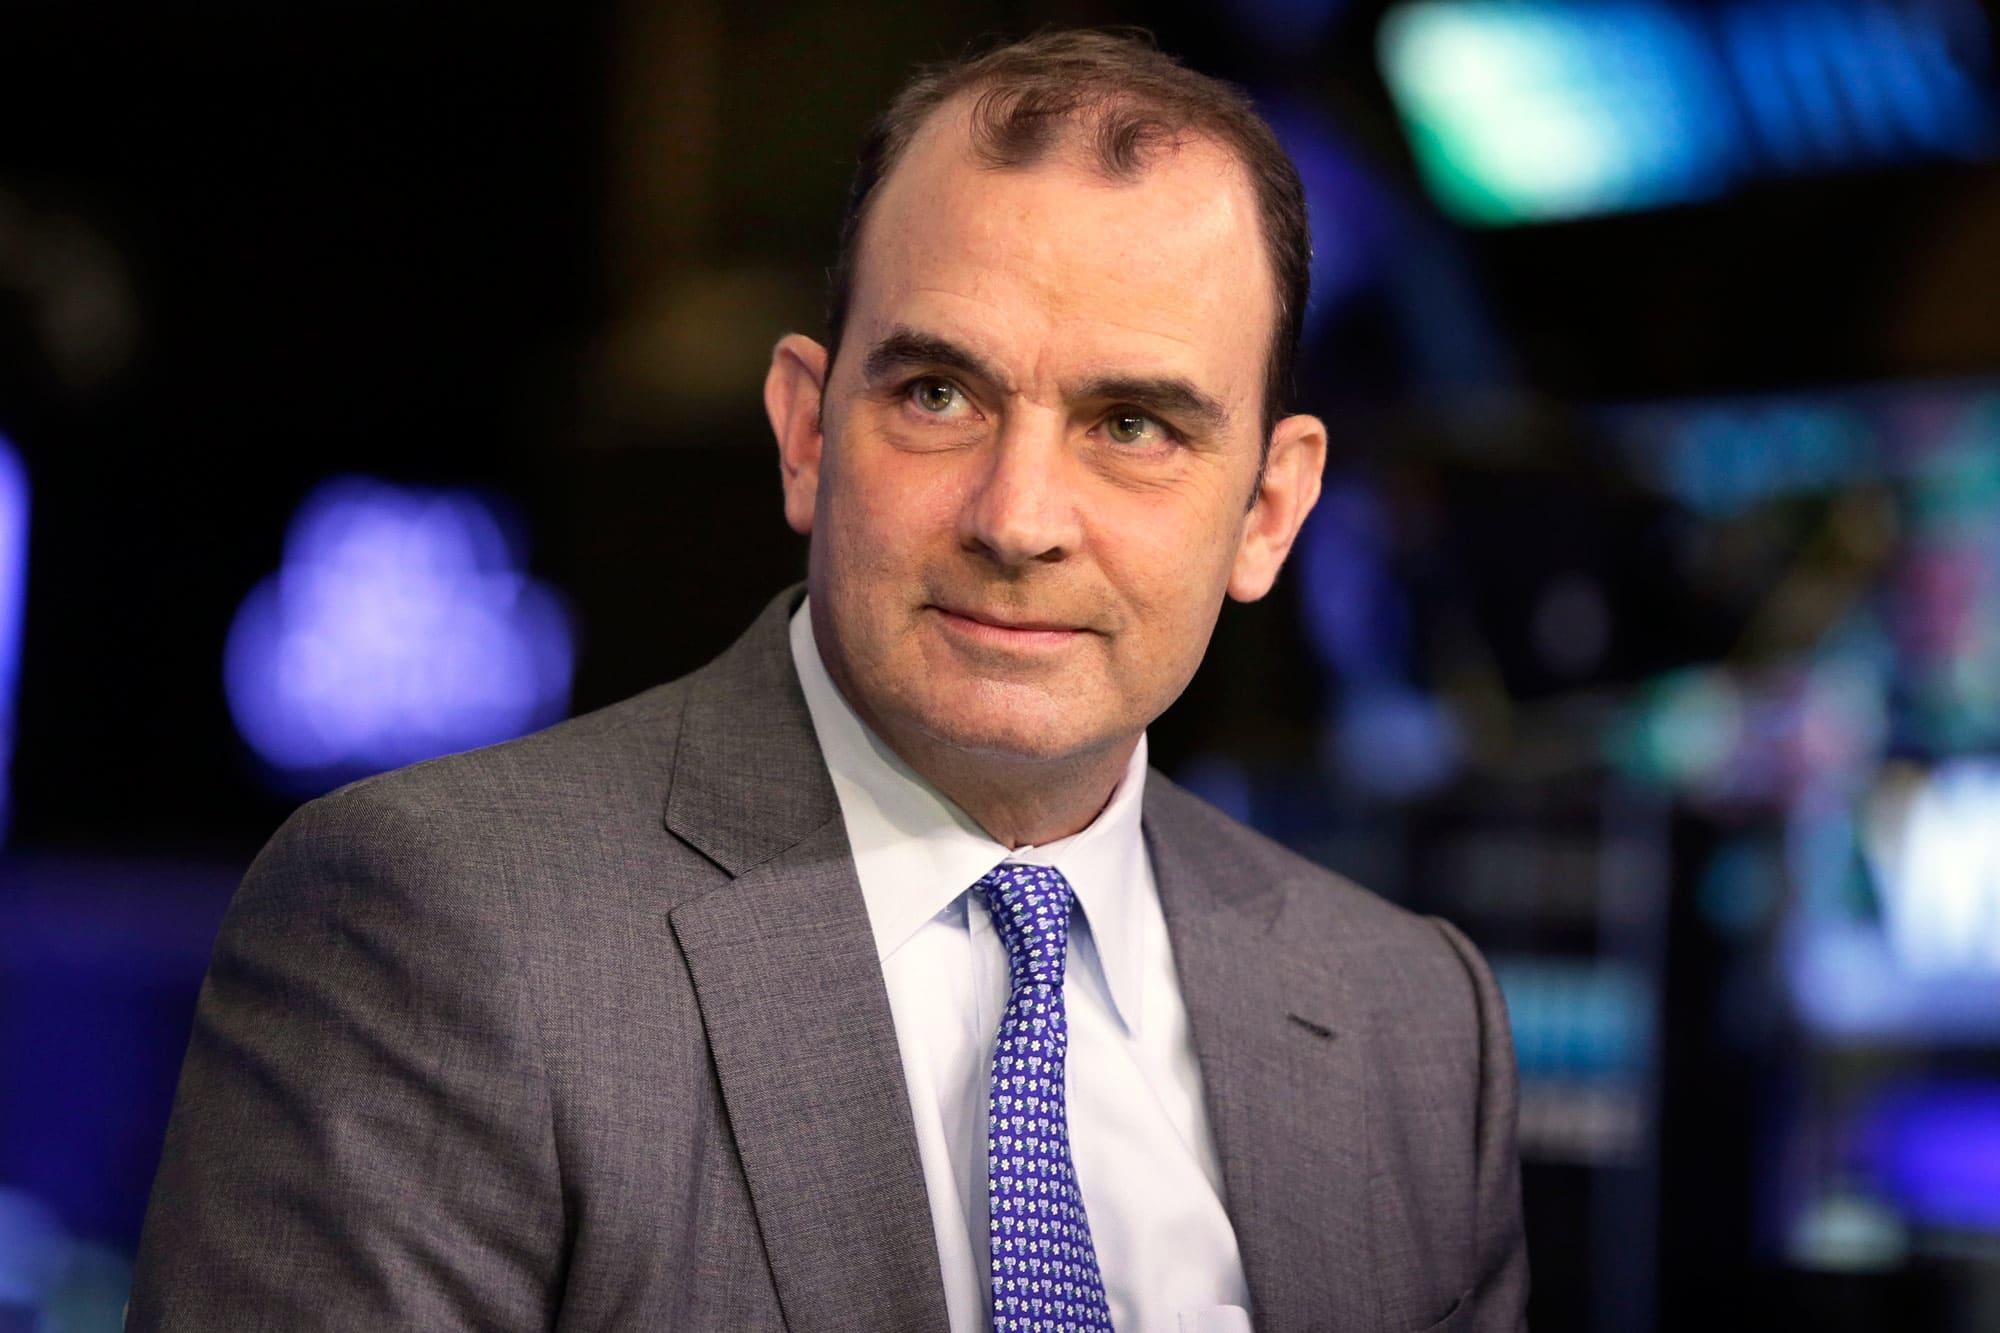 Wells Fargo CFO blames unauthorized accounts on under-performers